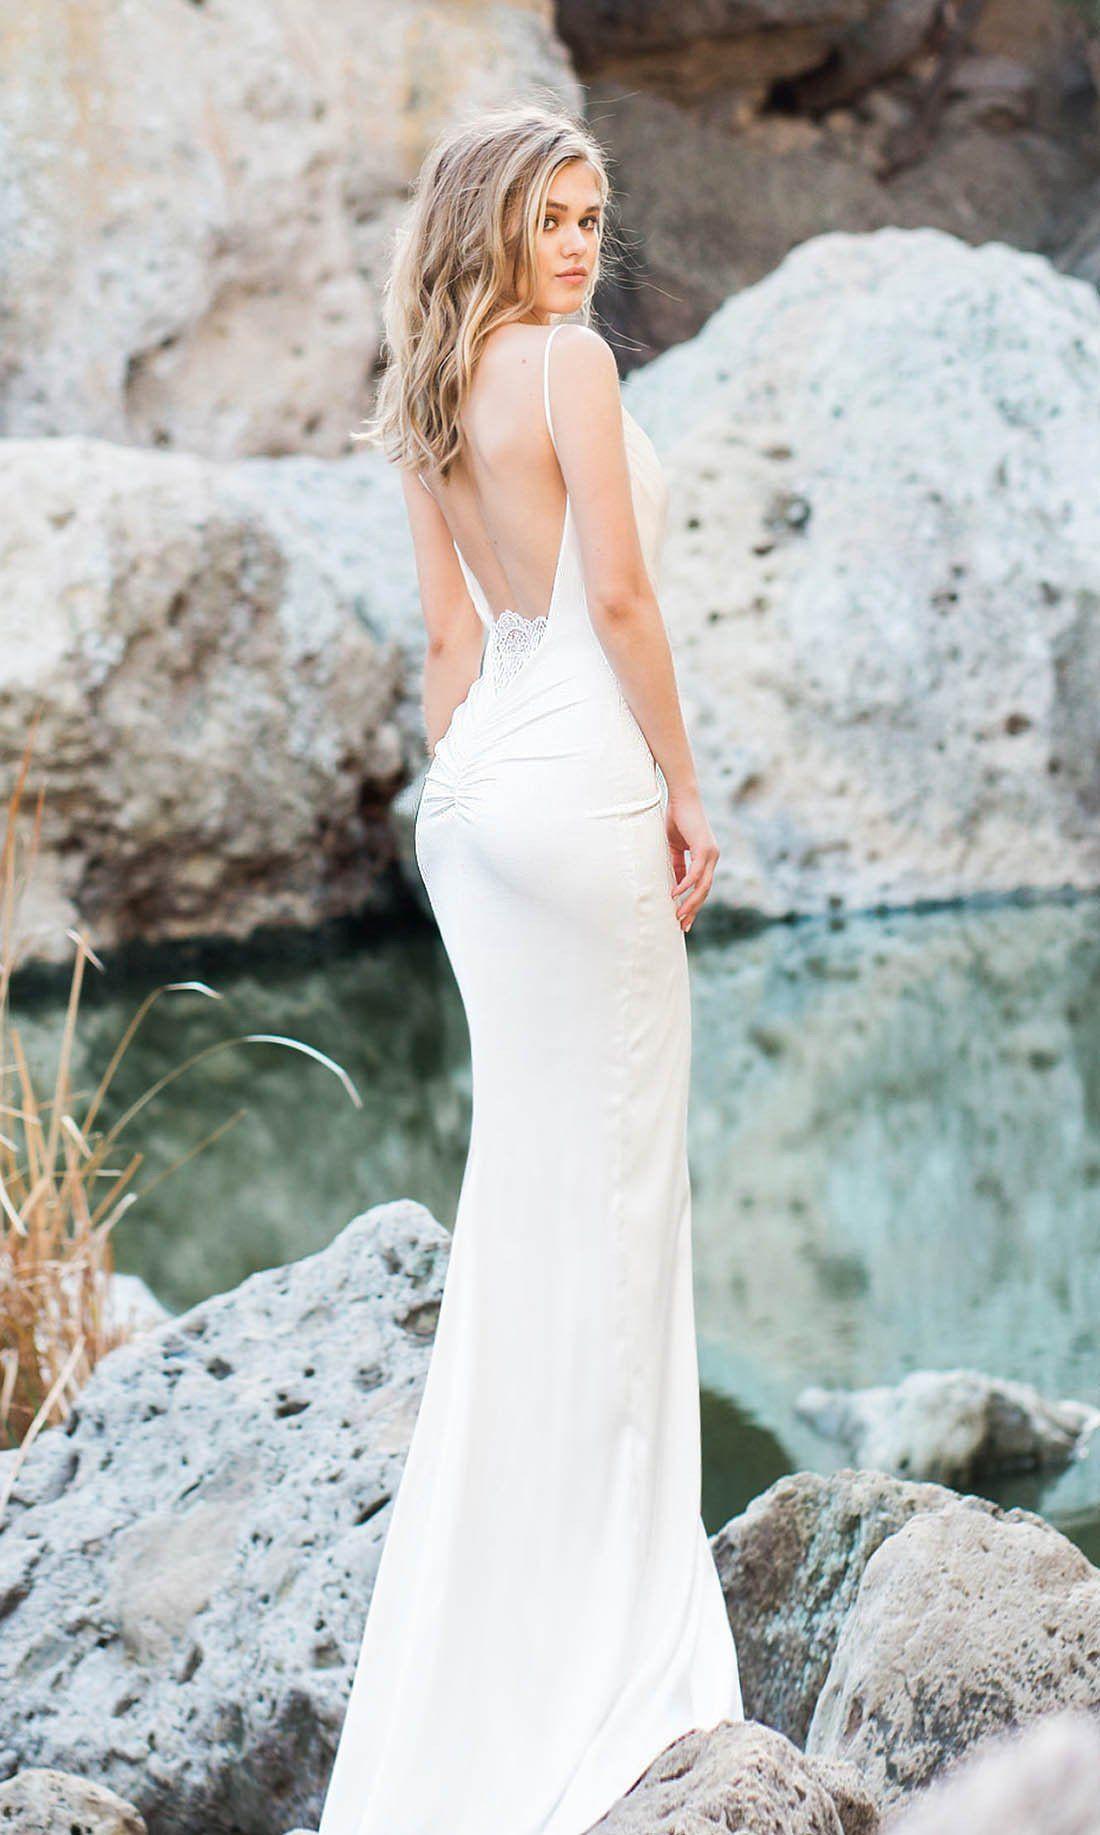 Katie May   Avalon   Available at Portland a&be bridal shop ...